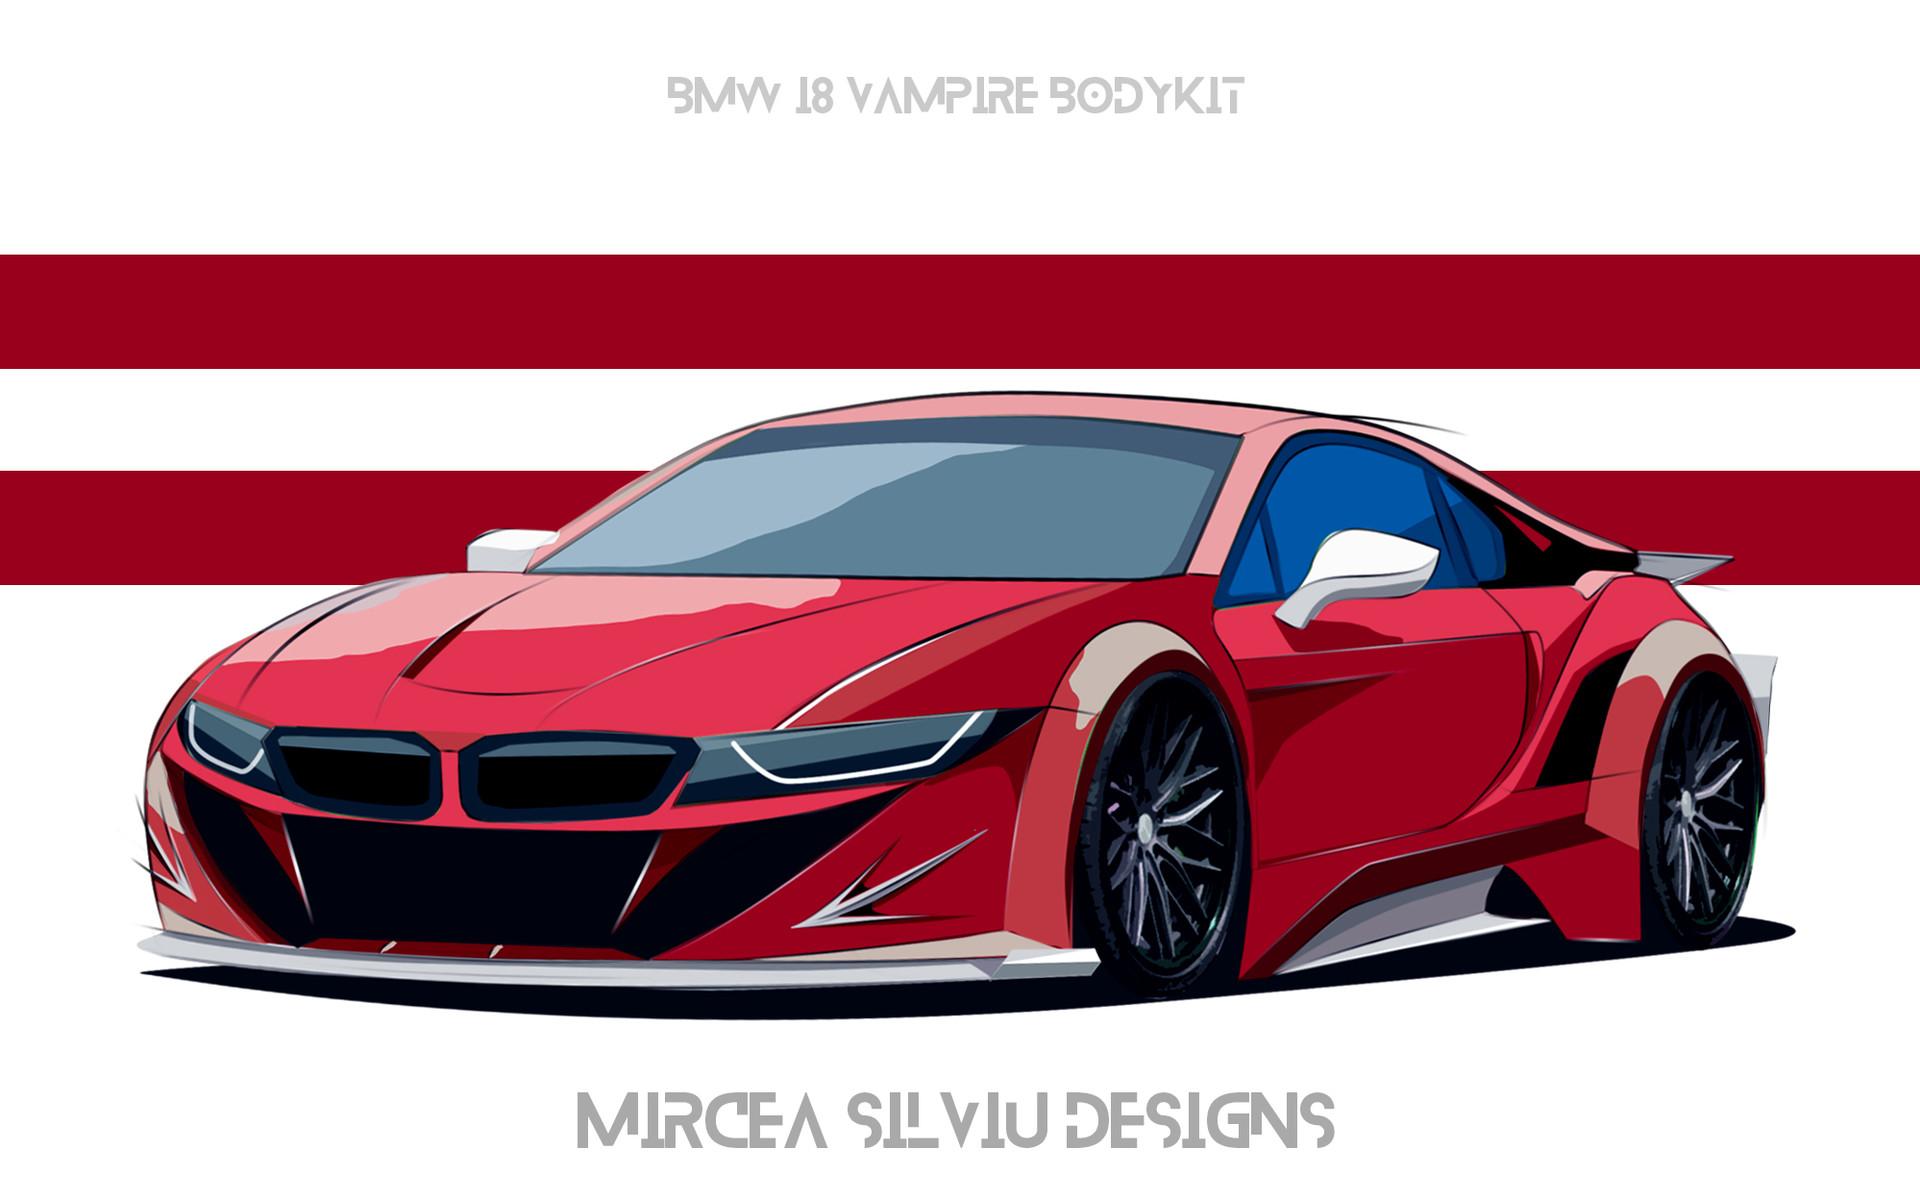 Artstation Bmw I8 Vampire Bodykit Mircea Silviu